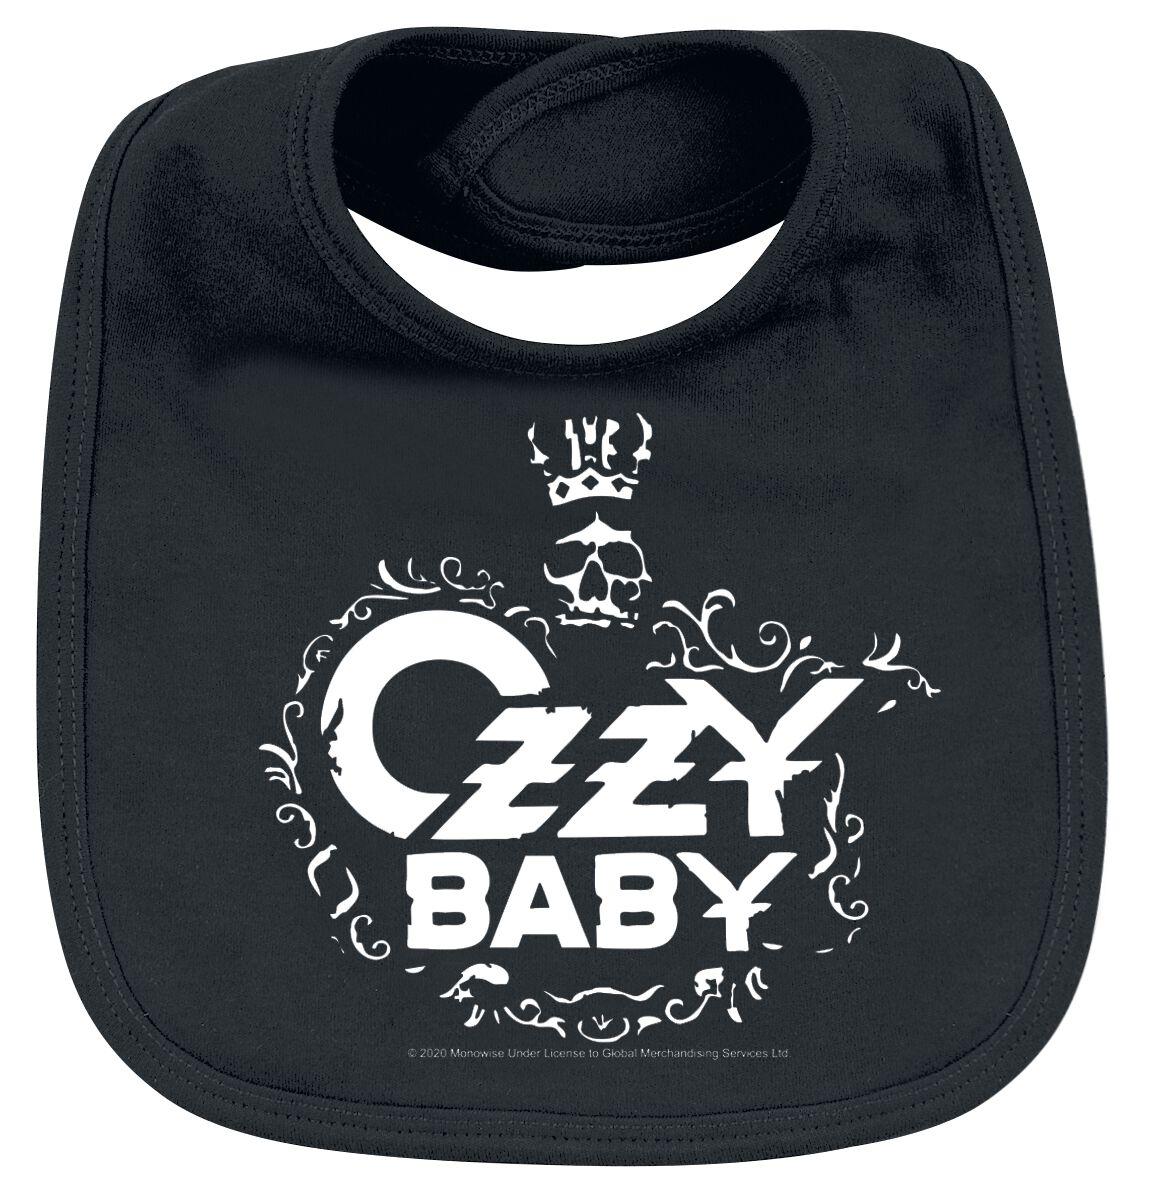 Image of Ozzy Osbourne Ozzy Baby Baby Lätzchen schwarz